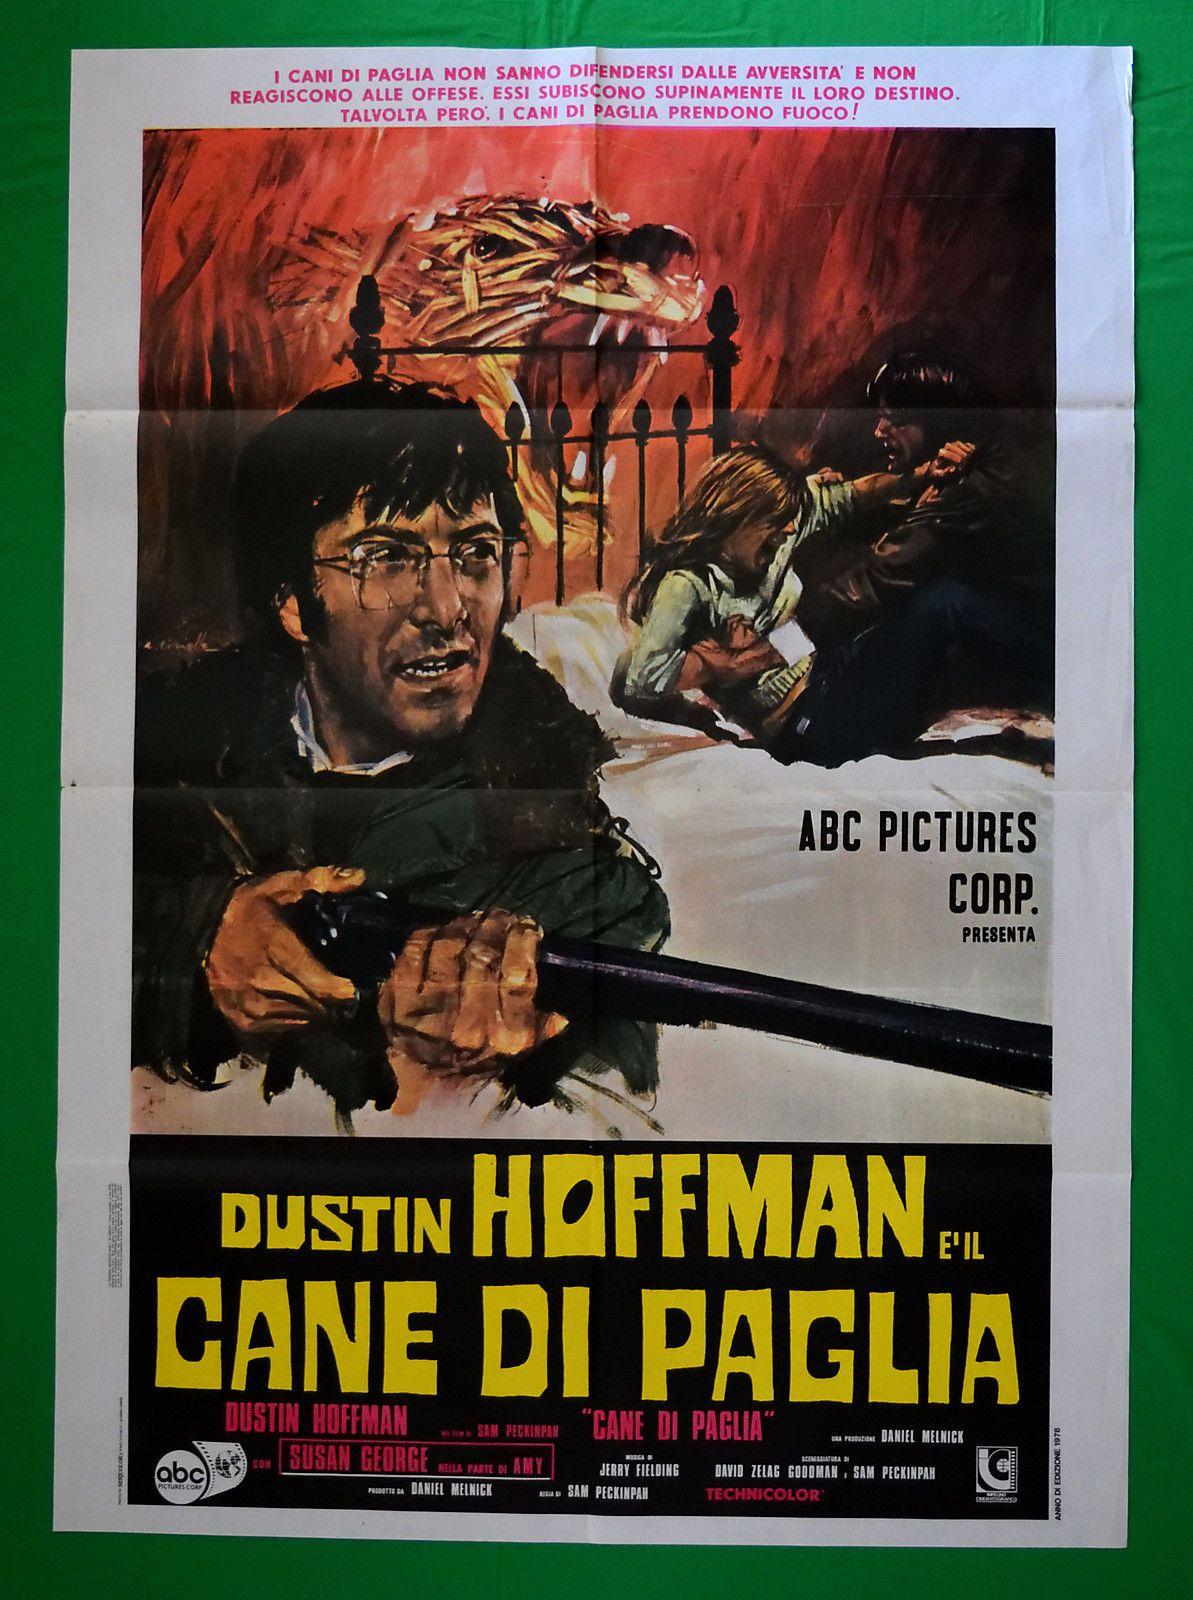 La Recensione Di Cane Di Paglia Straw Dogs Di Sam Peckinpah 1971 Con Dustin Hoffman Susan George Peter Vaughan T P Dustin Hoffman Film Stranieri Cani